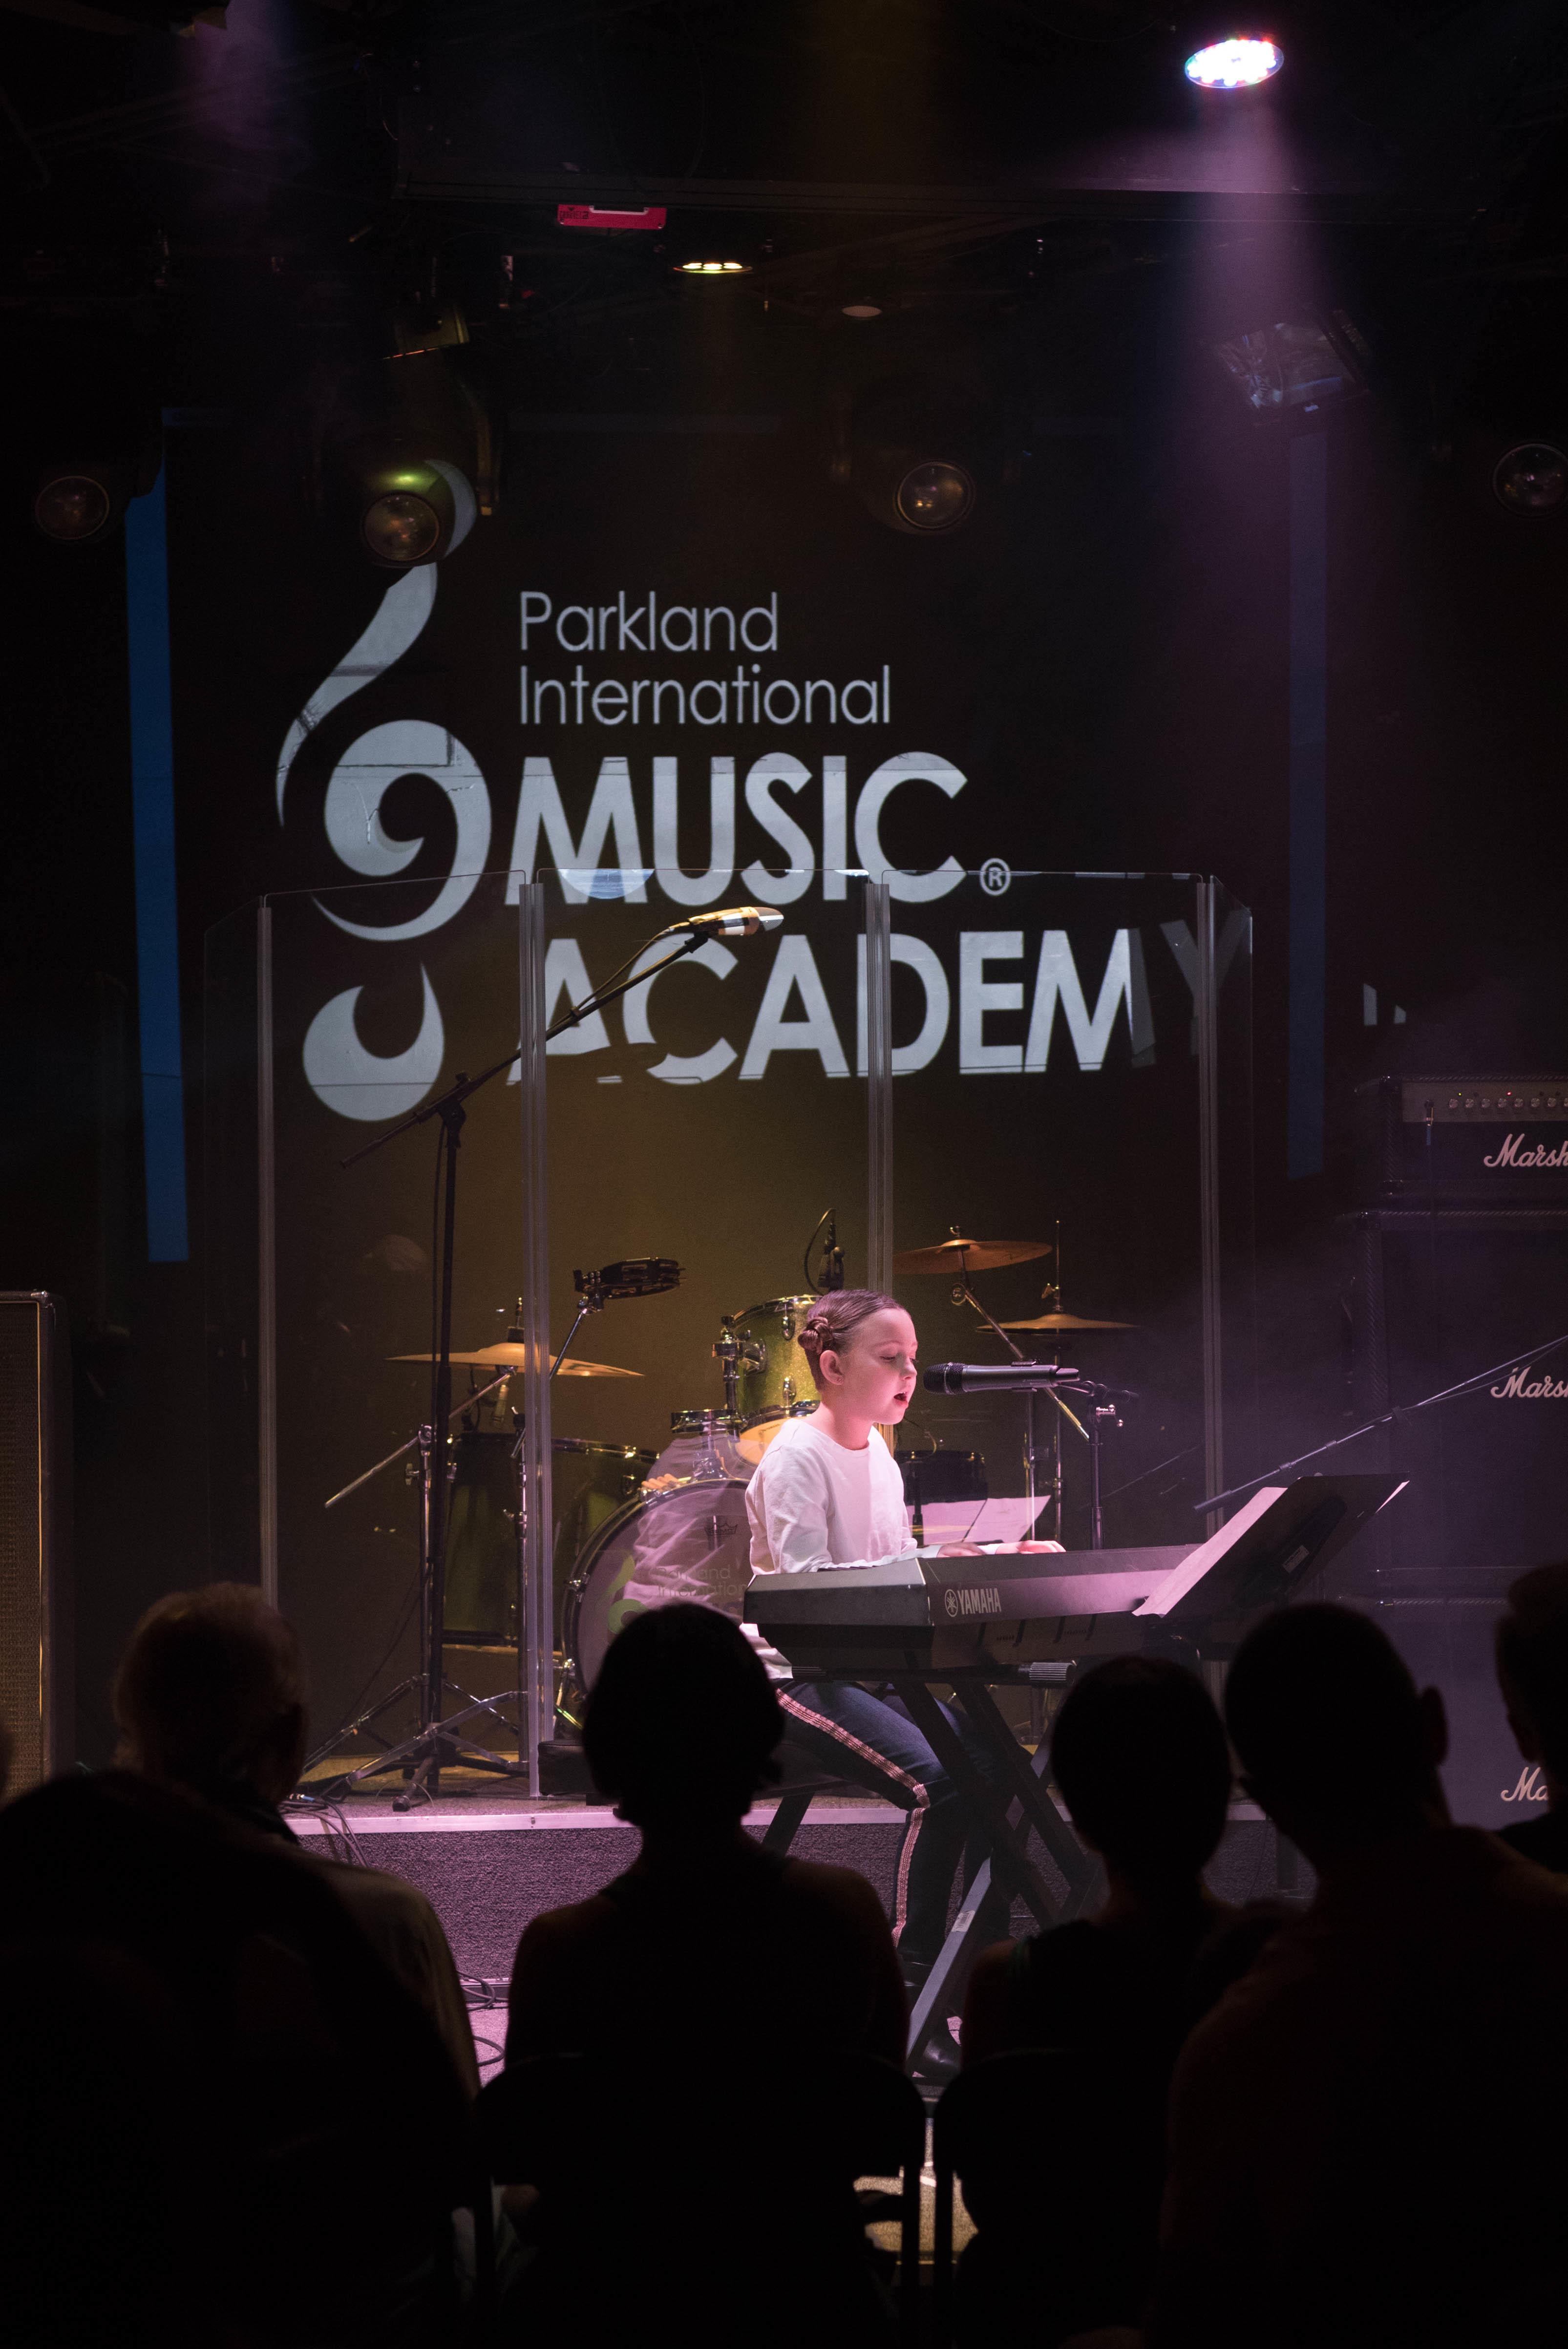 Parkland International Music Academy image 18